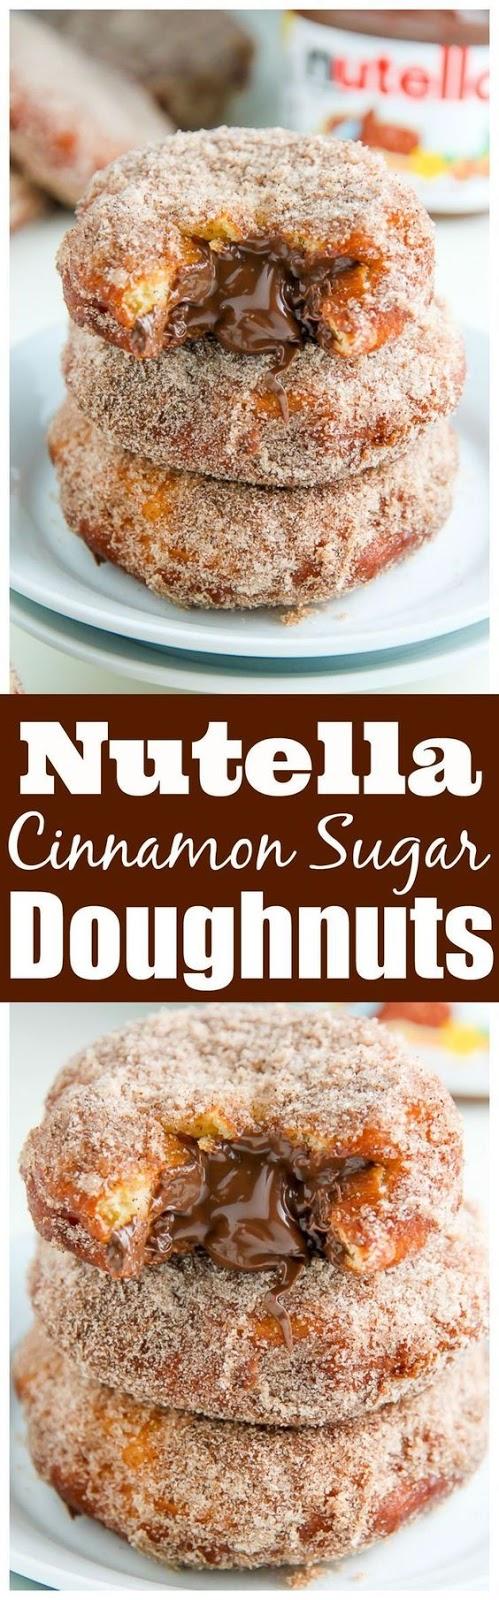 Nutella Cinnamon Sugar Doughnuts #Nutellarecipe #Nutellafood #Cinnamon #Sugar #Doughnuts #Dessert #italiandessert #Americandessert #Unitedstatedsdessert